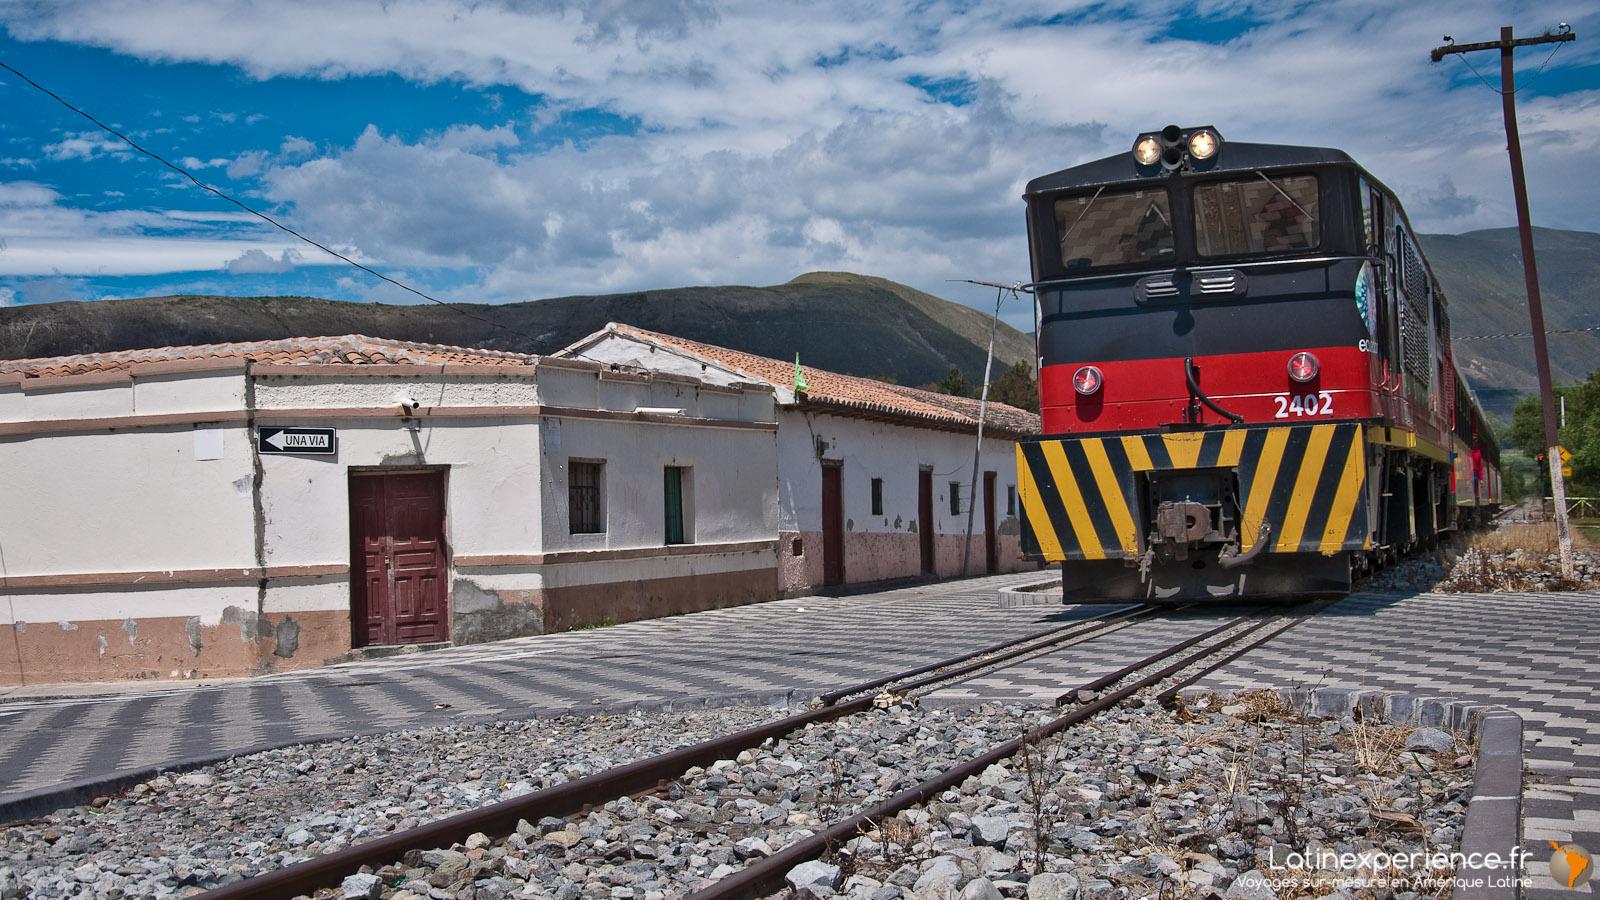 Equateur - Salinas -  Tren de la Libertad - Latinexperience voyages